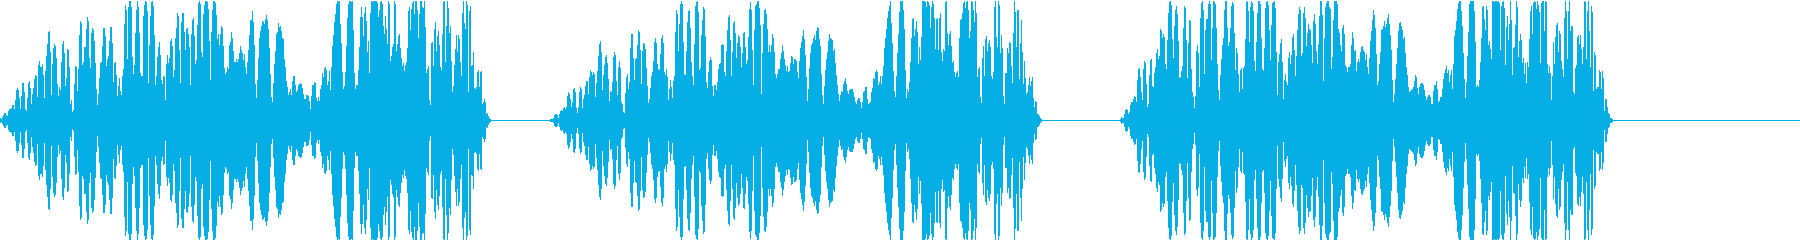 DJプレイ スクラッチ・ノイズ 256の再生済みの波形